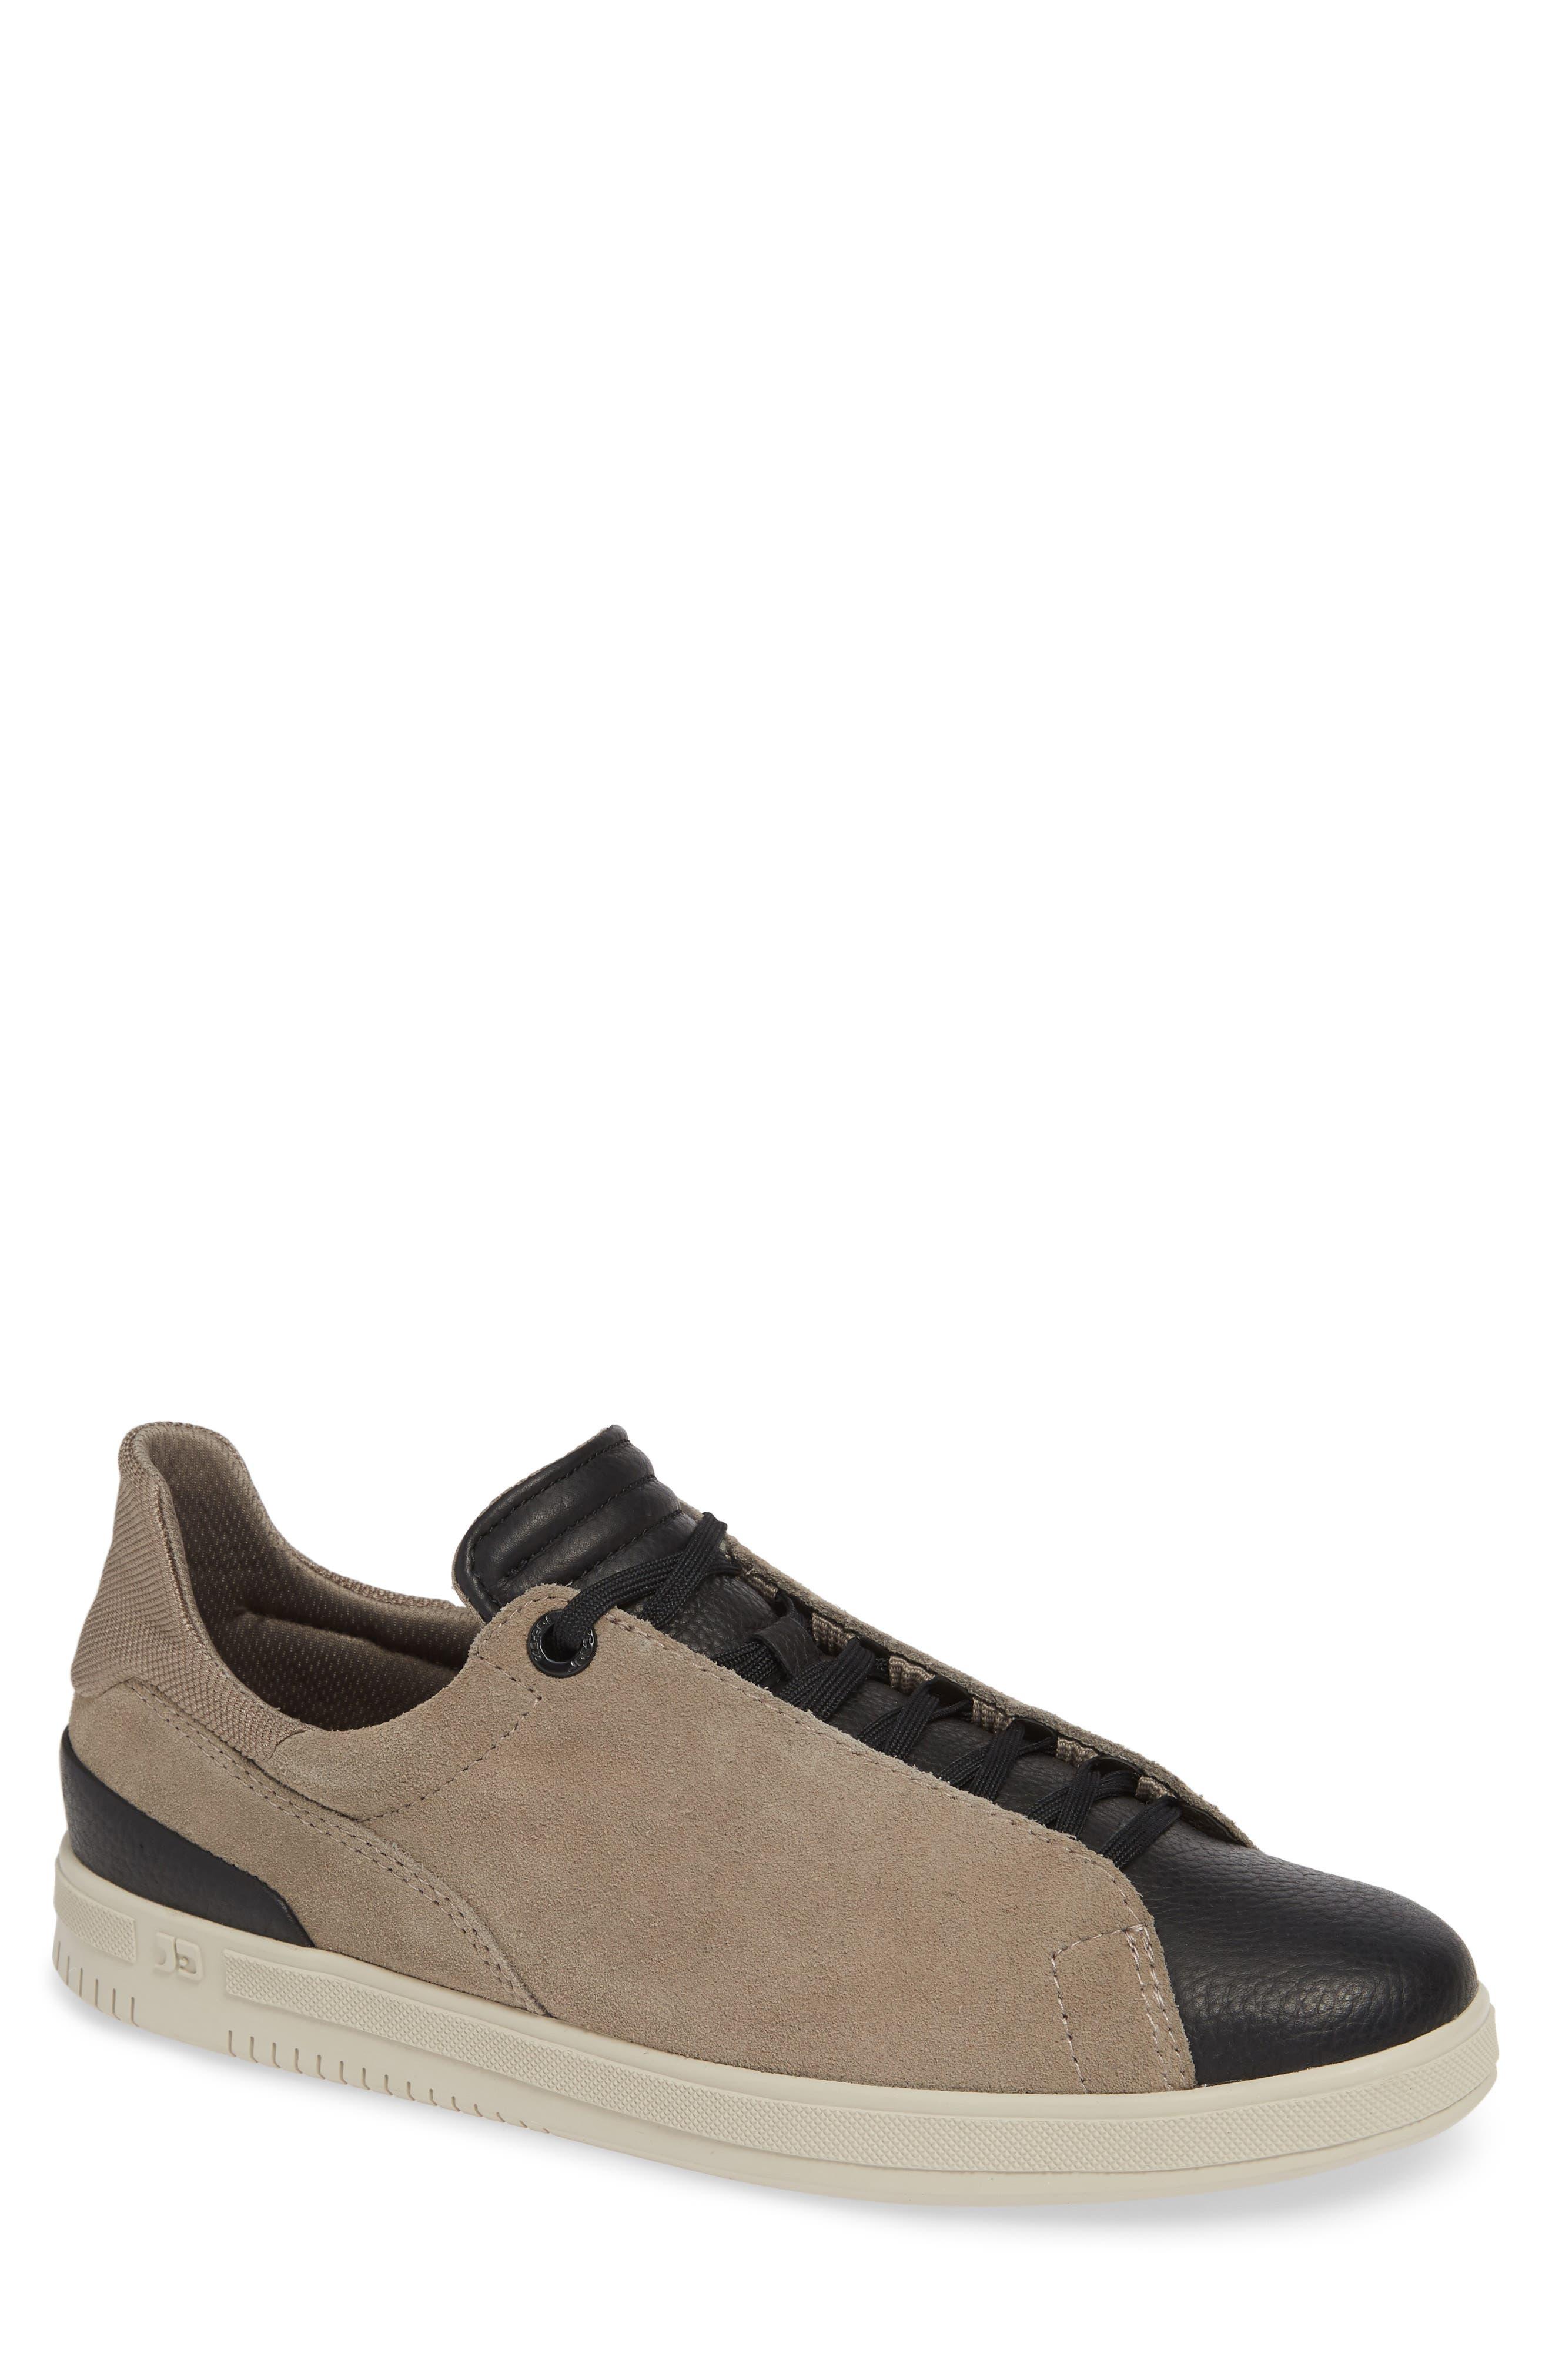 Joe Papa Low Top Sneaker,                         Main,                         color, STONE/ BLACK